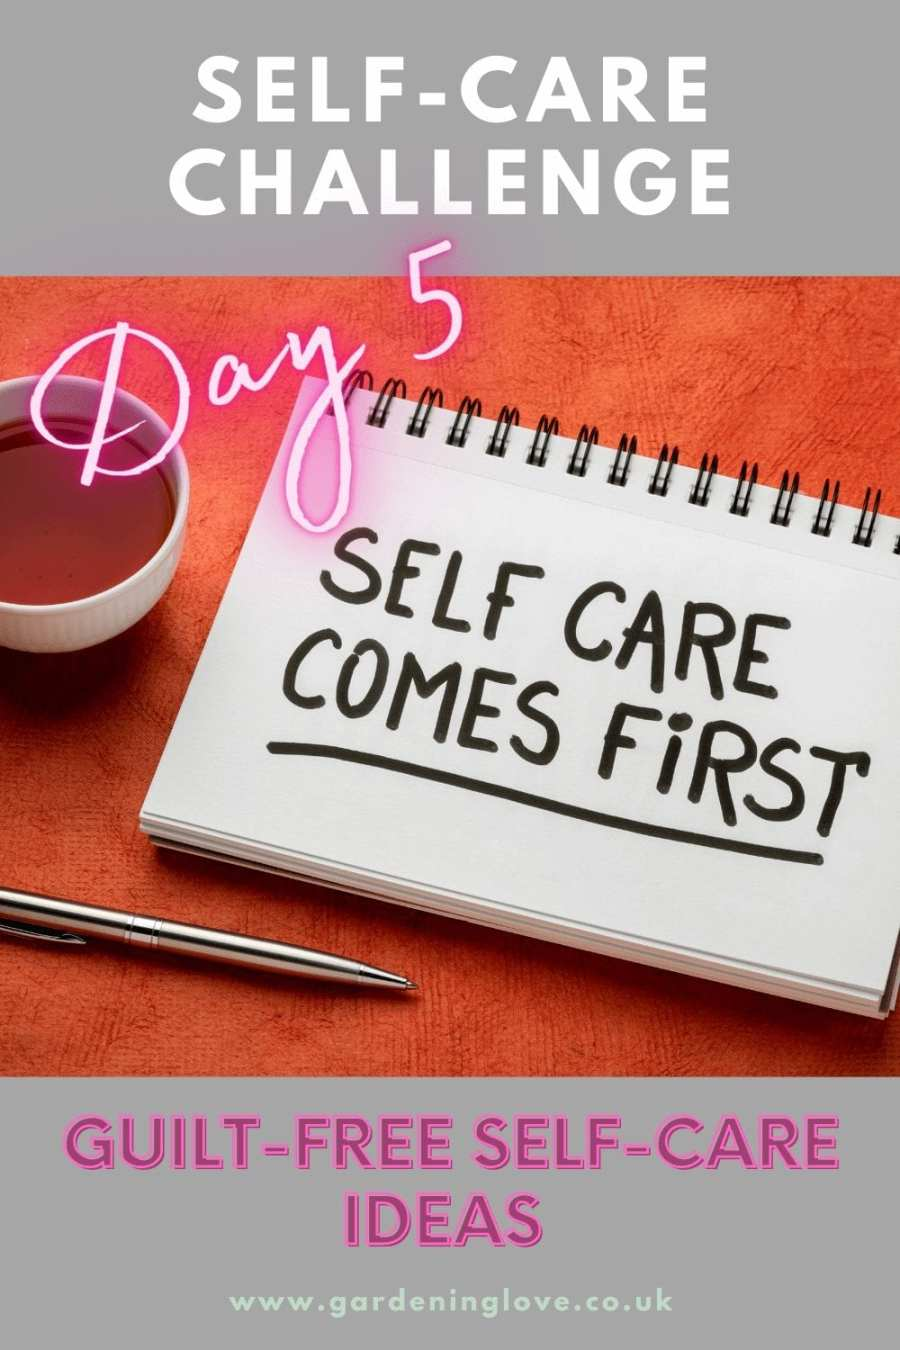 Guilt free self care ideas. Self-care isn't selfish. #selfcare